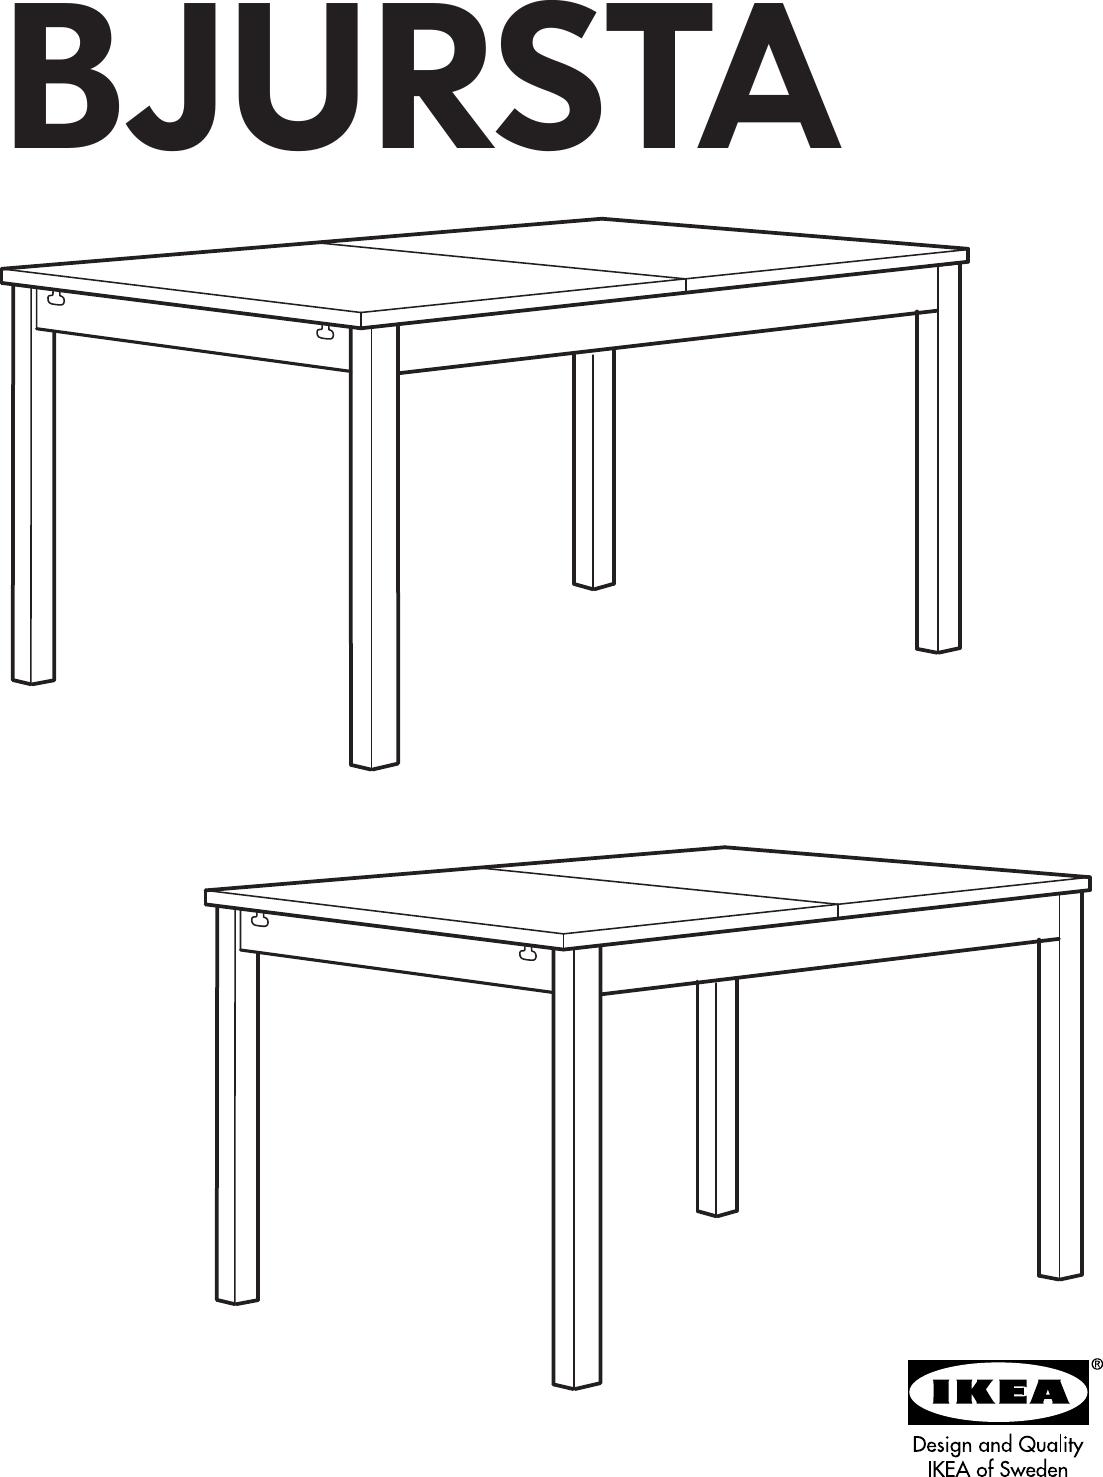 Ikea Bjursta Extendable Dining Table 69 86 102 X37 Assembly Instruction